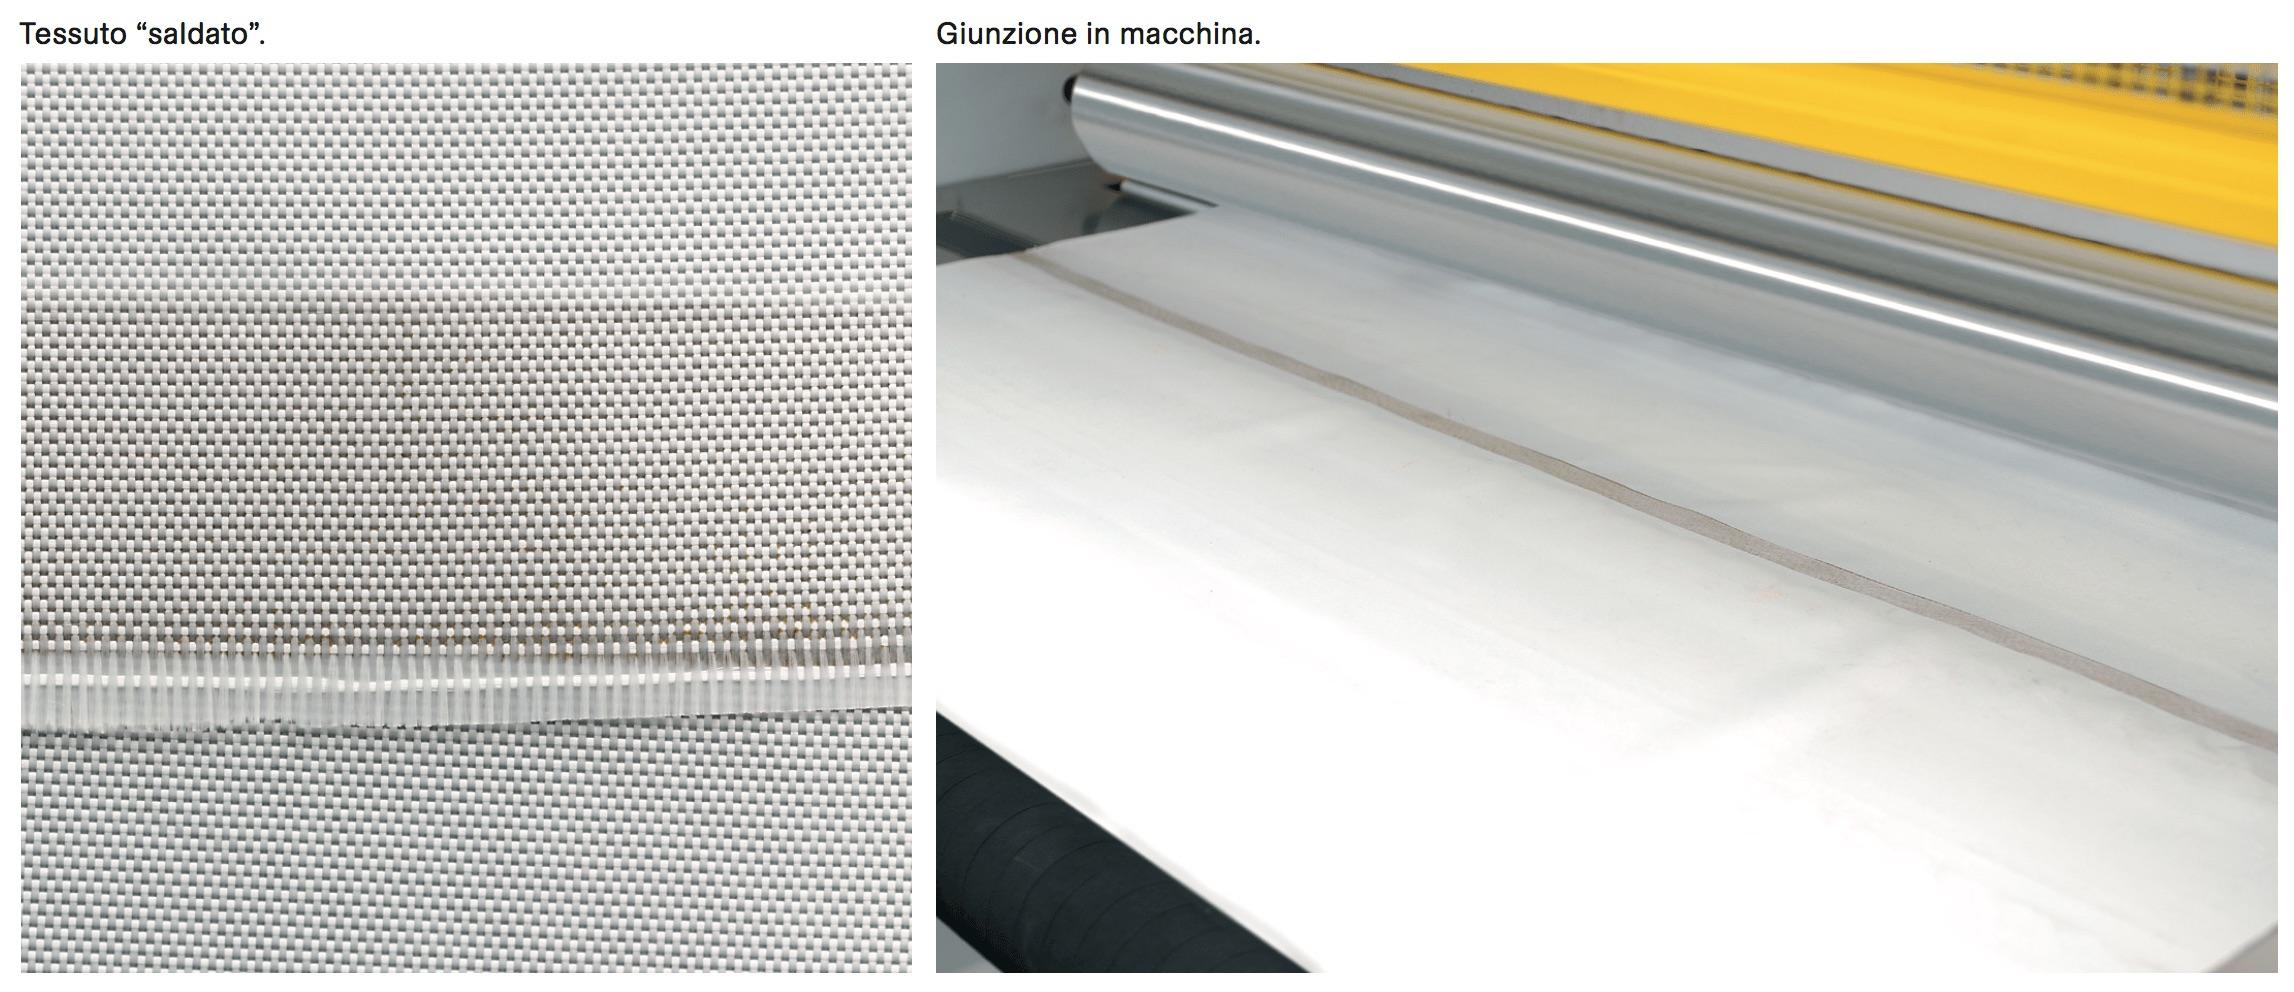 termosaldatura-tessuti-macchine-per-termosaldatura-tessile-presse-giunzione-a-caldo-dettaglio-pessa-a-giunzione